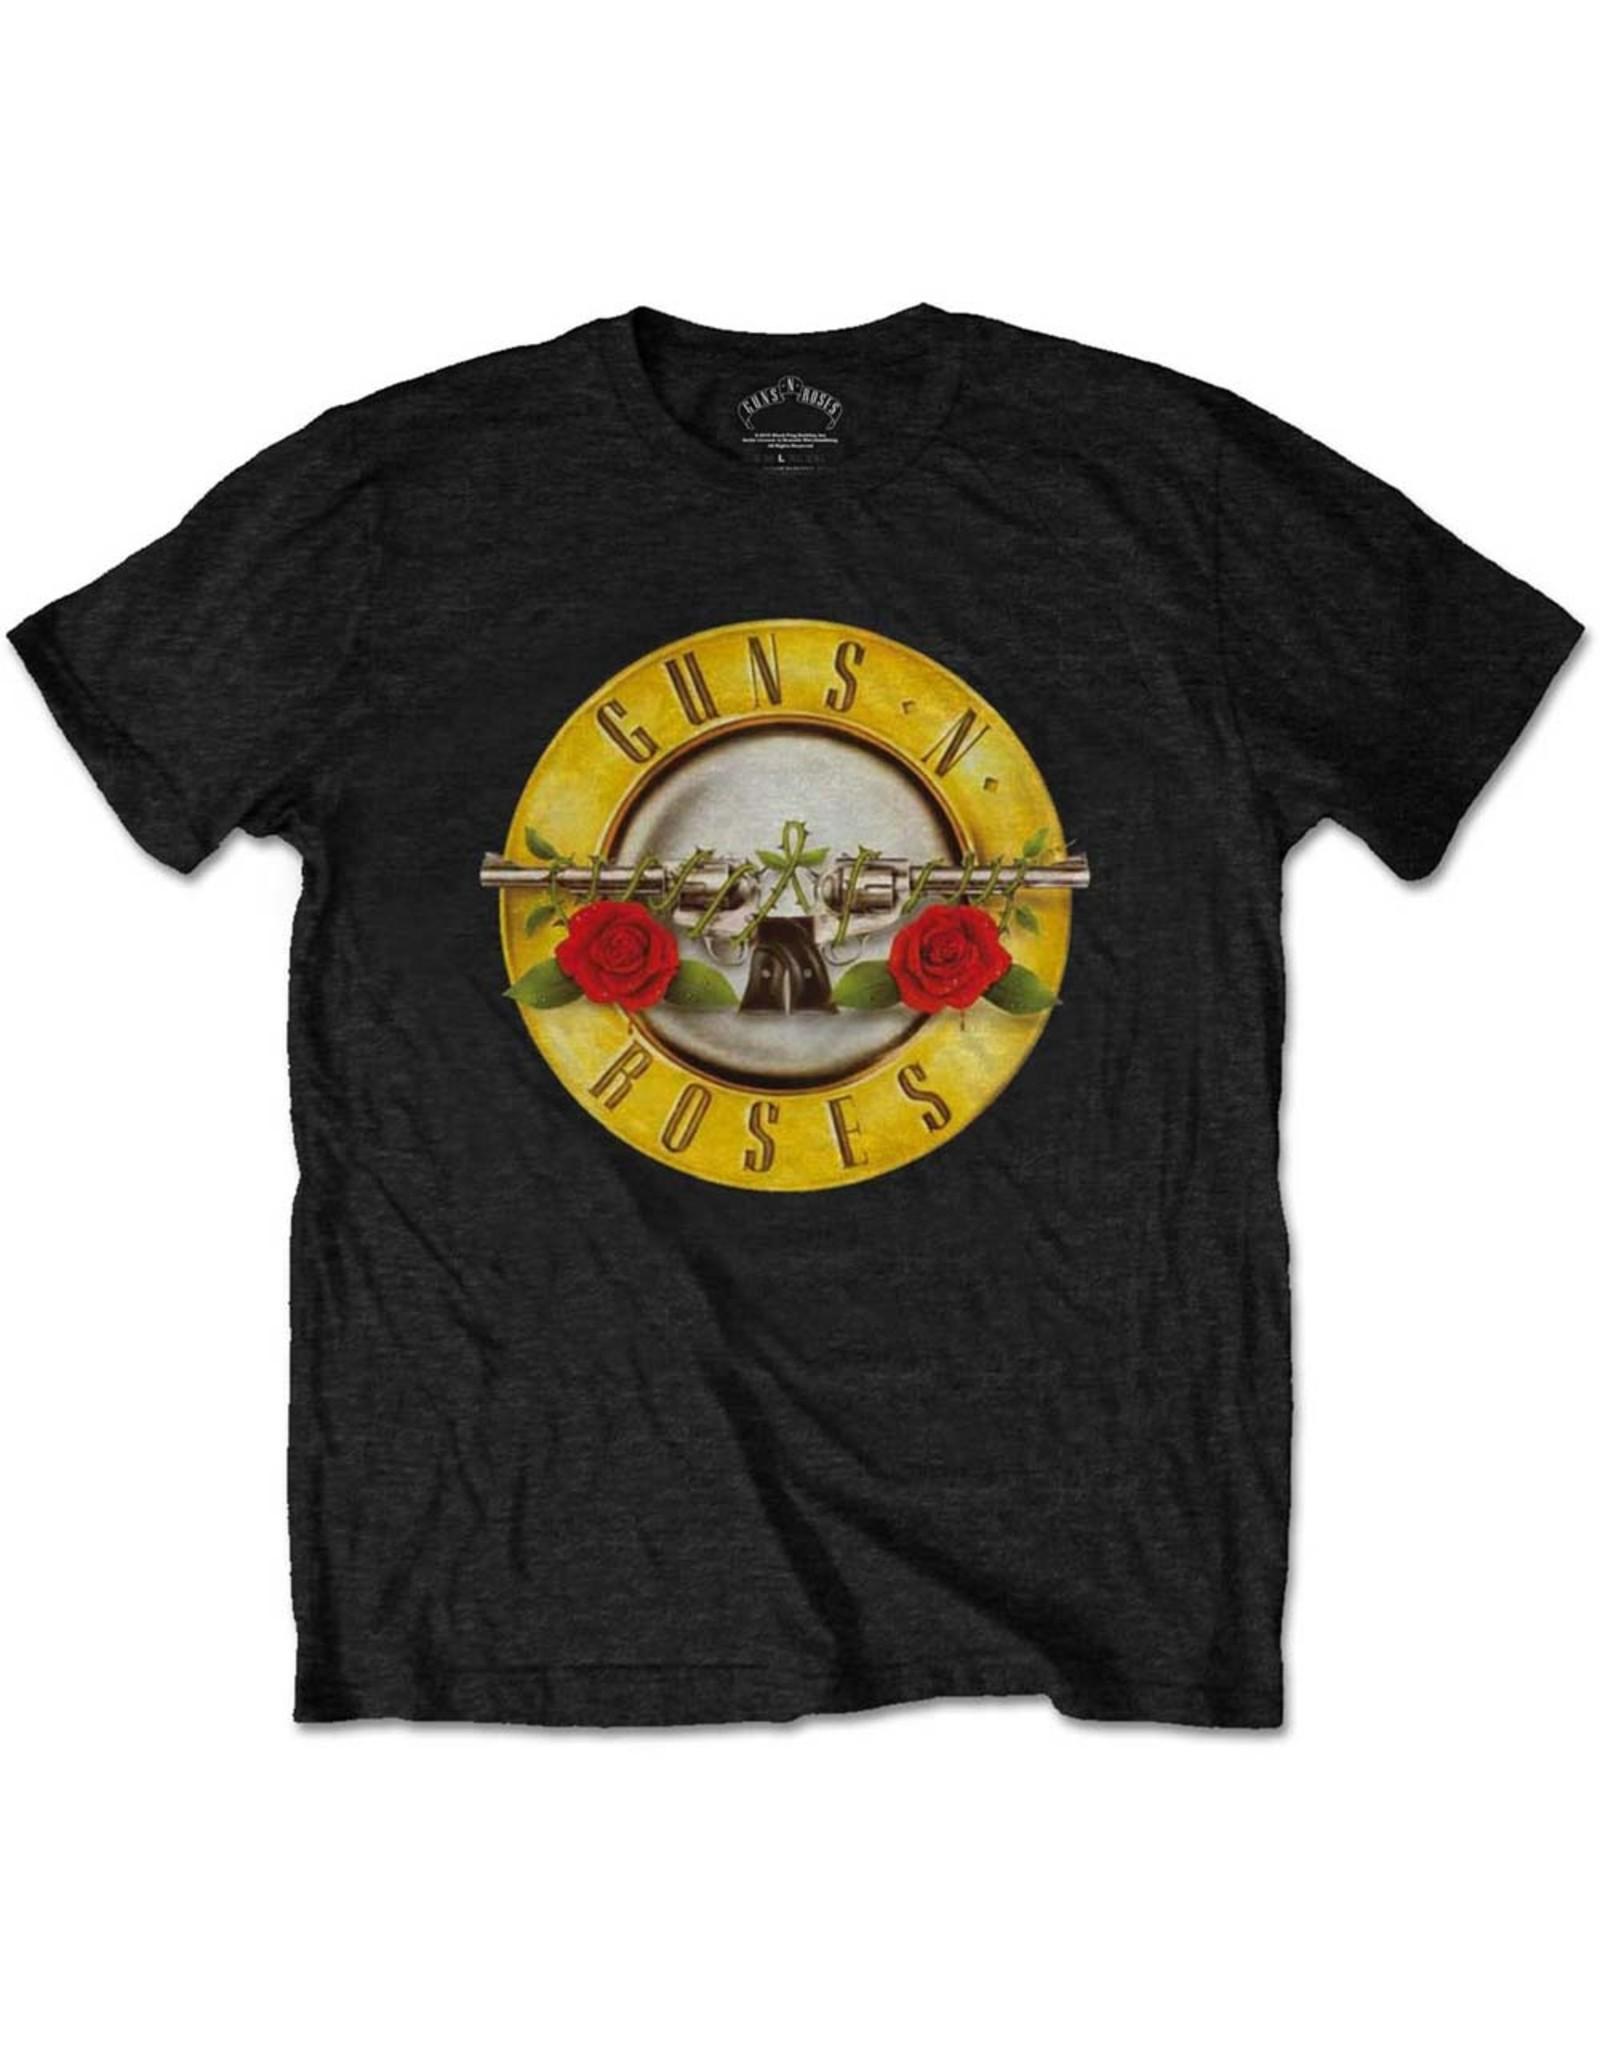 Guns N' Roses / Classic Logo Tee